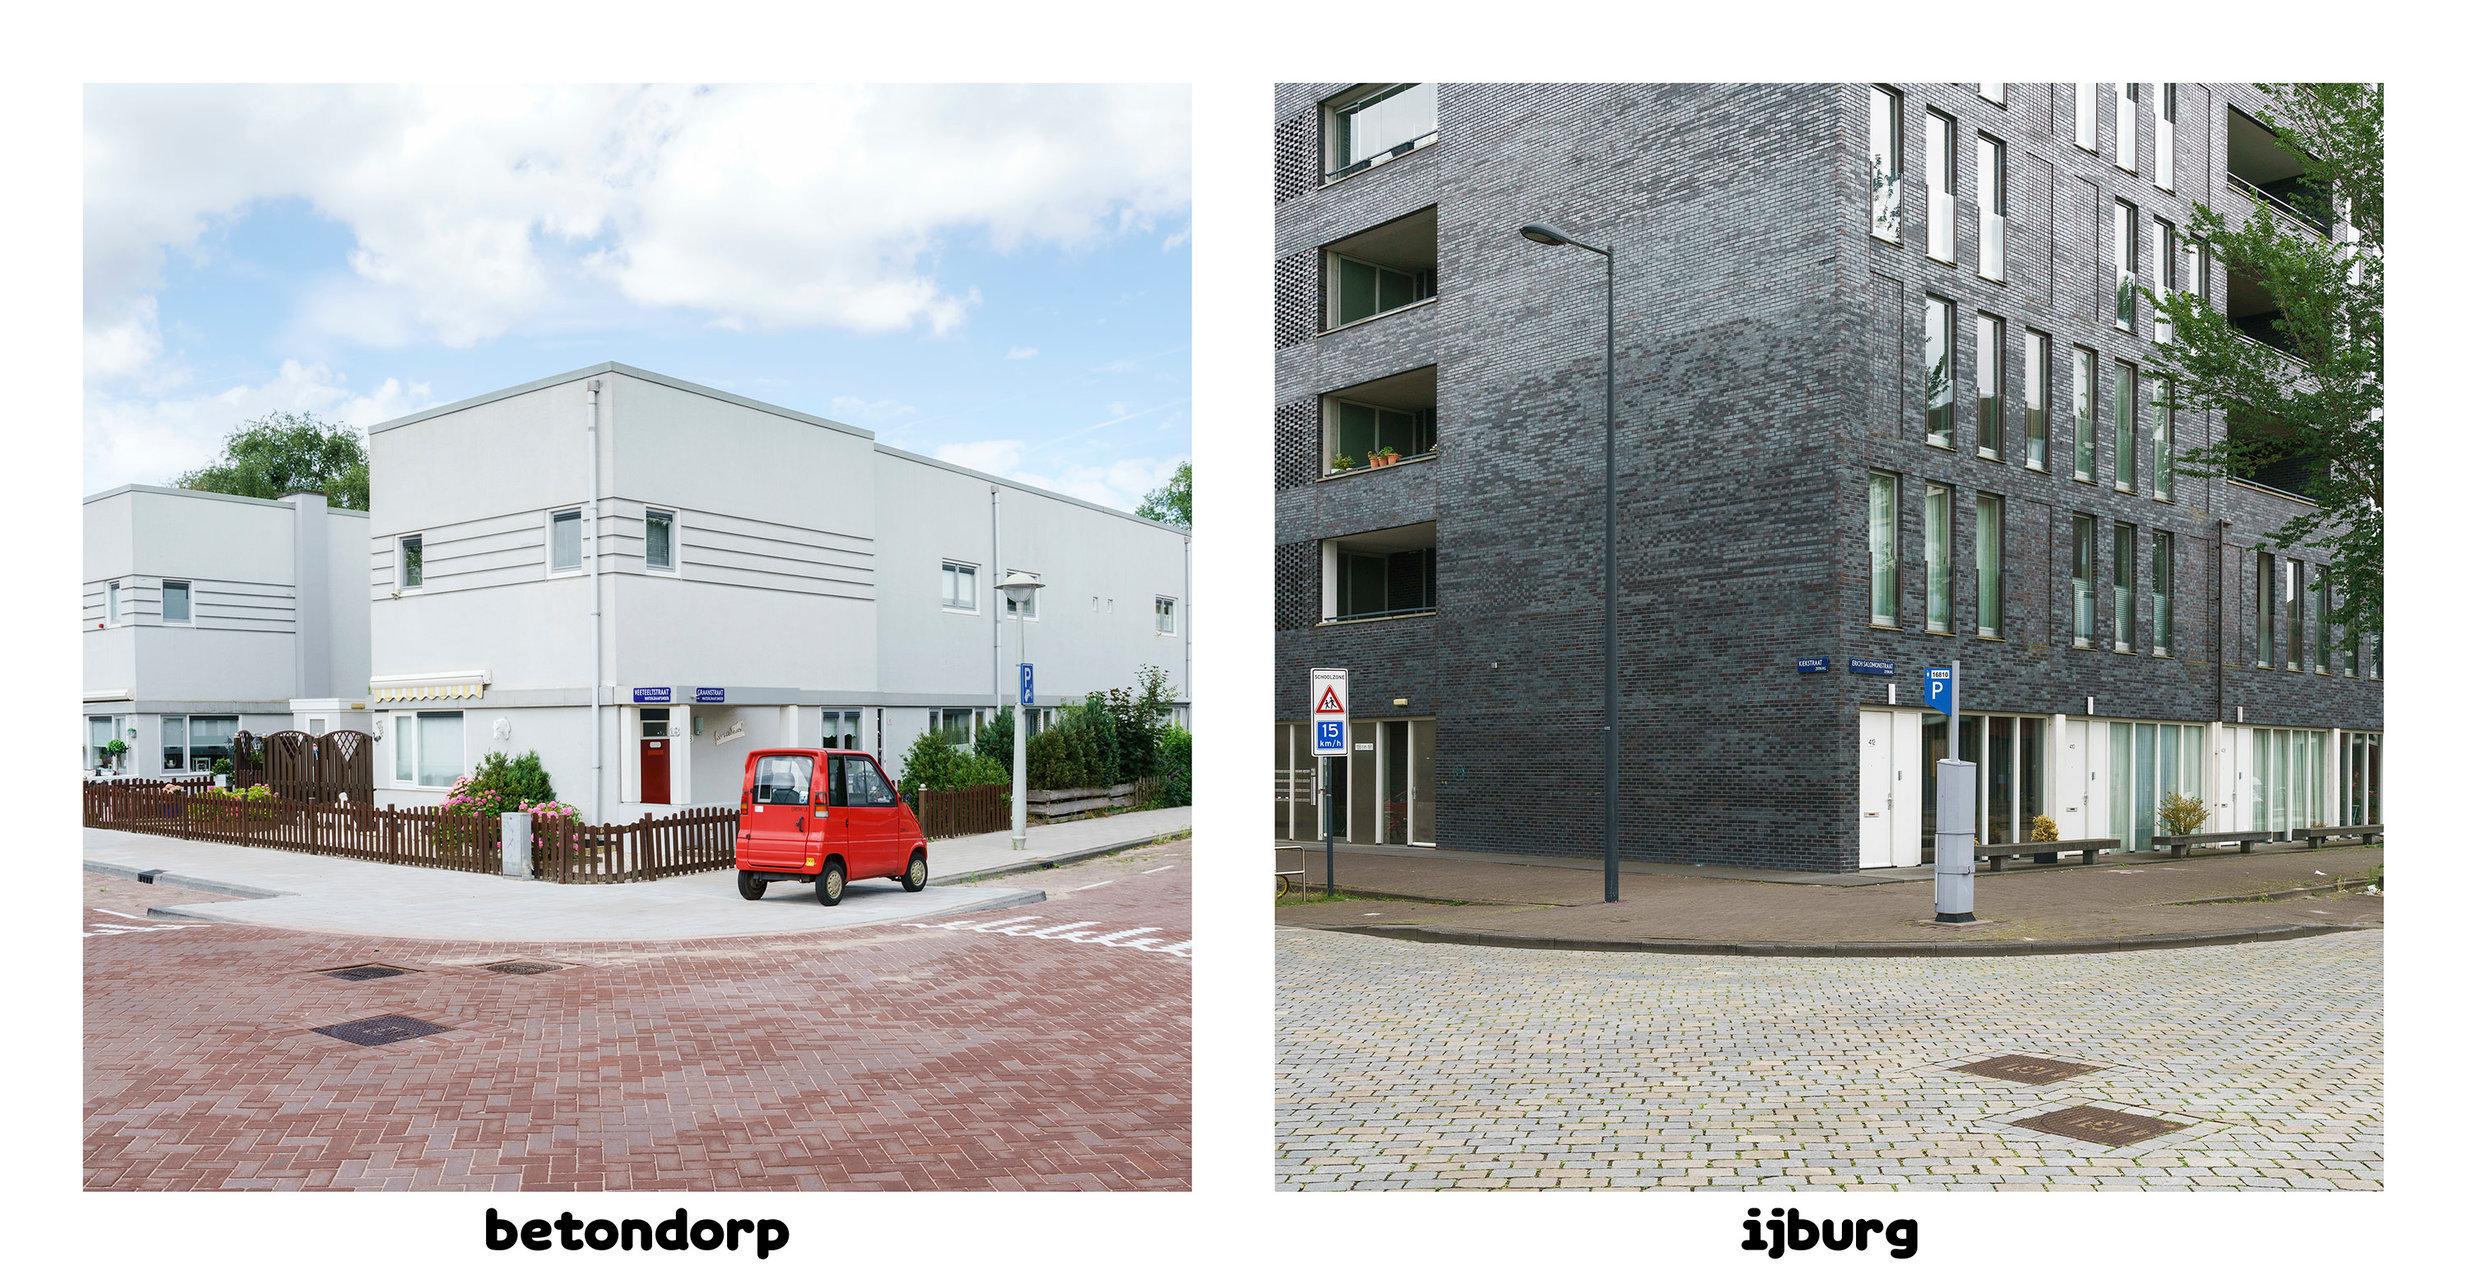 betondorp IJburg 2 Amsterdamsedingen Immink-Faber.jpg